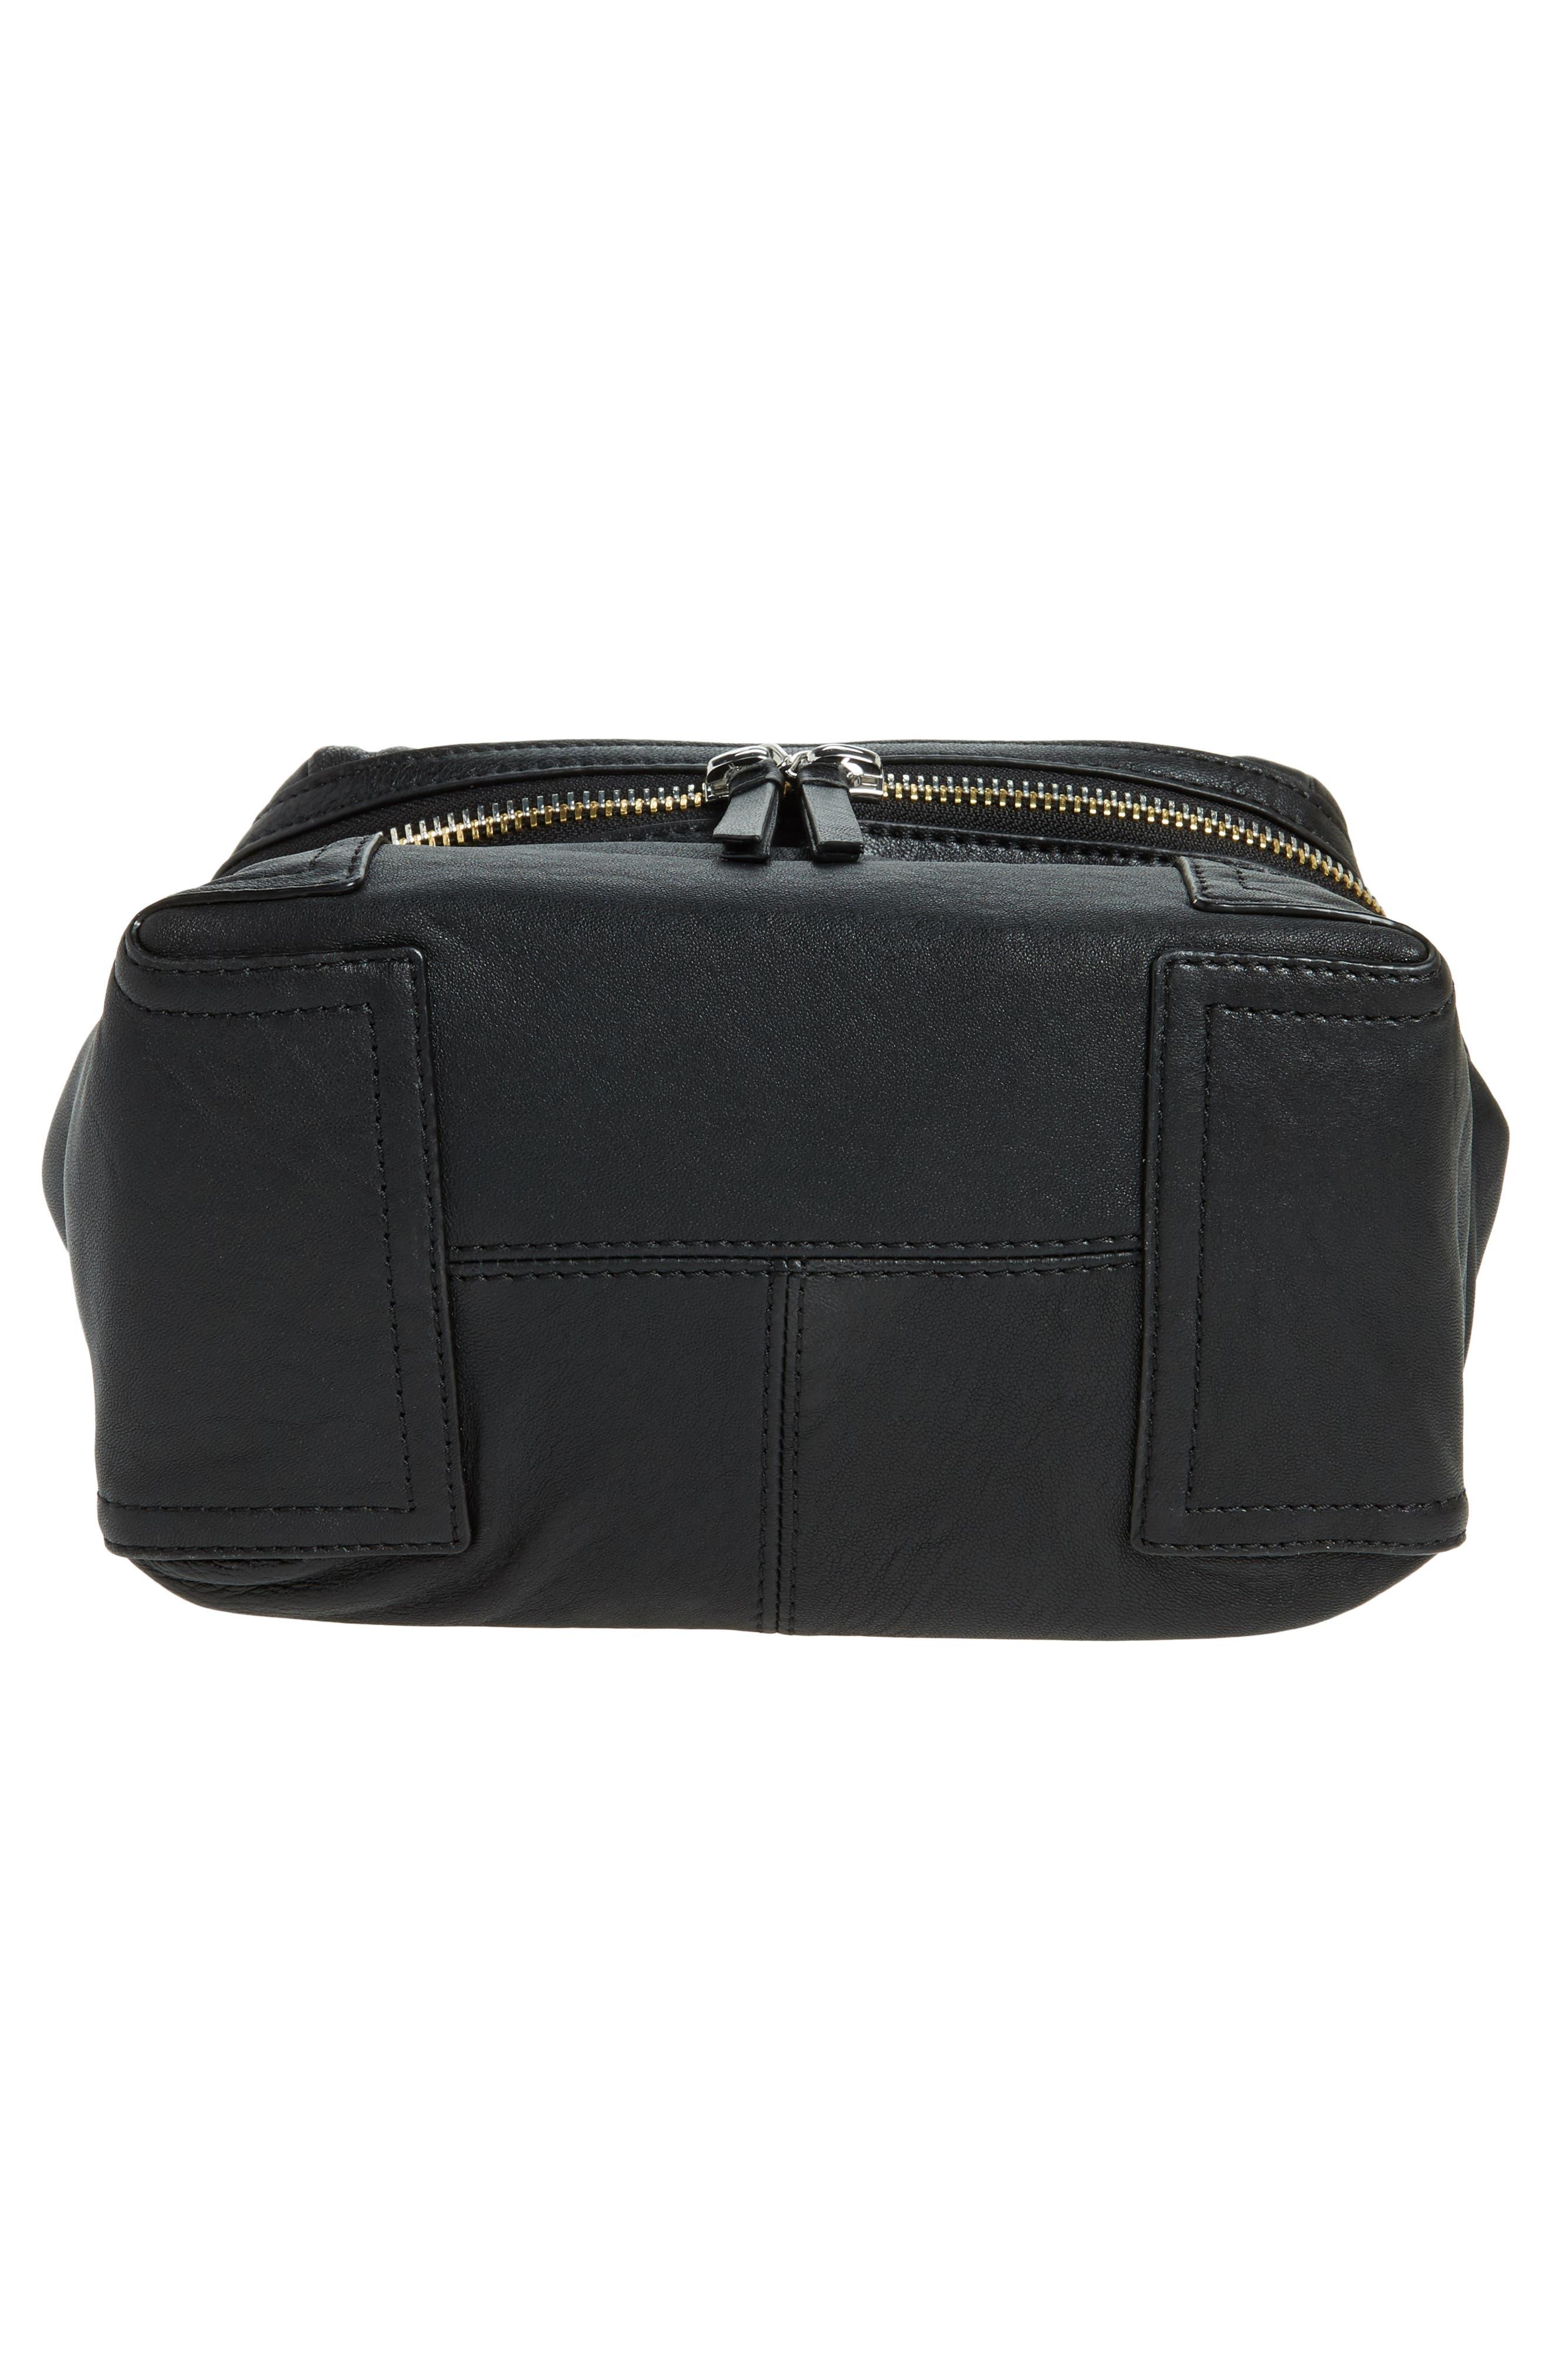 Medium Patch Leather Crossbody Bag,                             Alternate thumbnail 11, color,